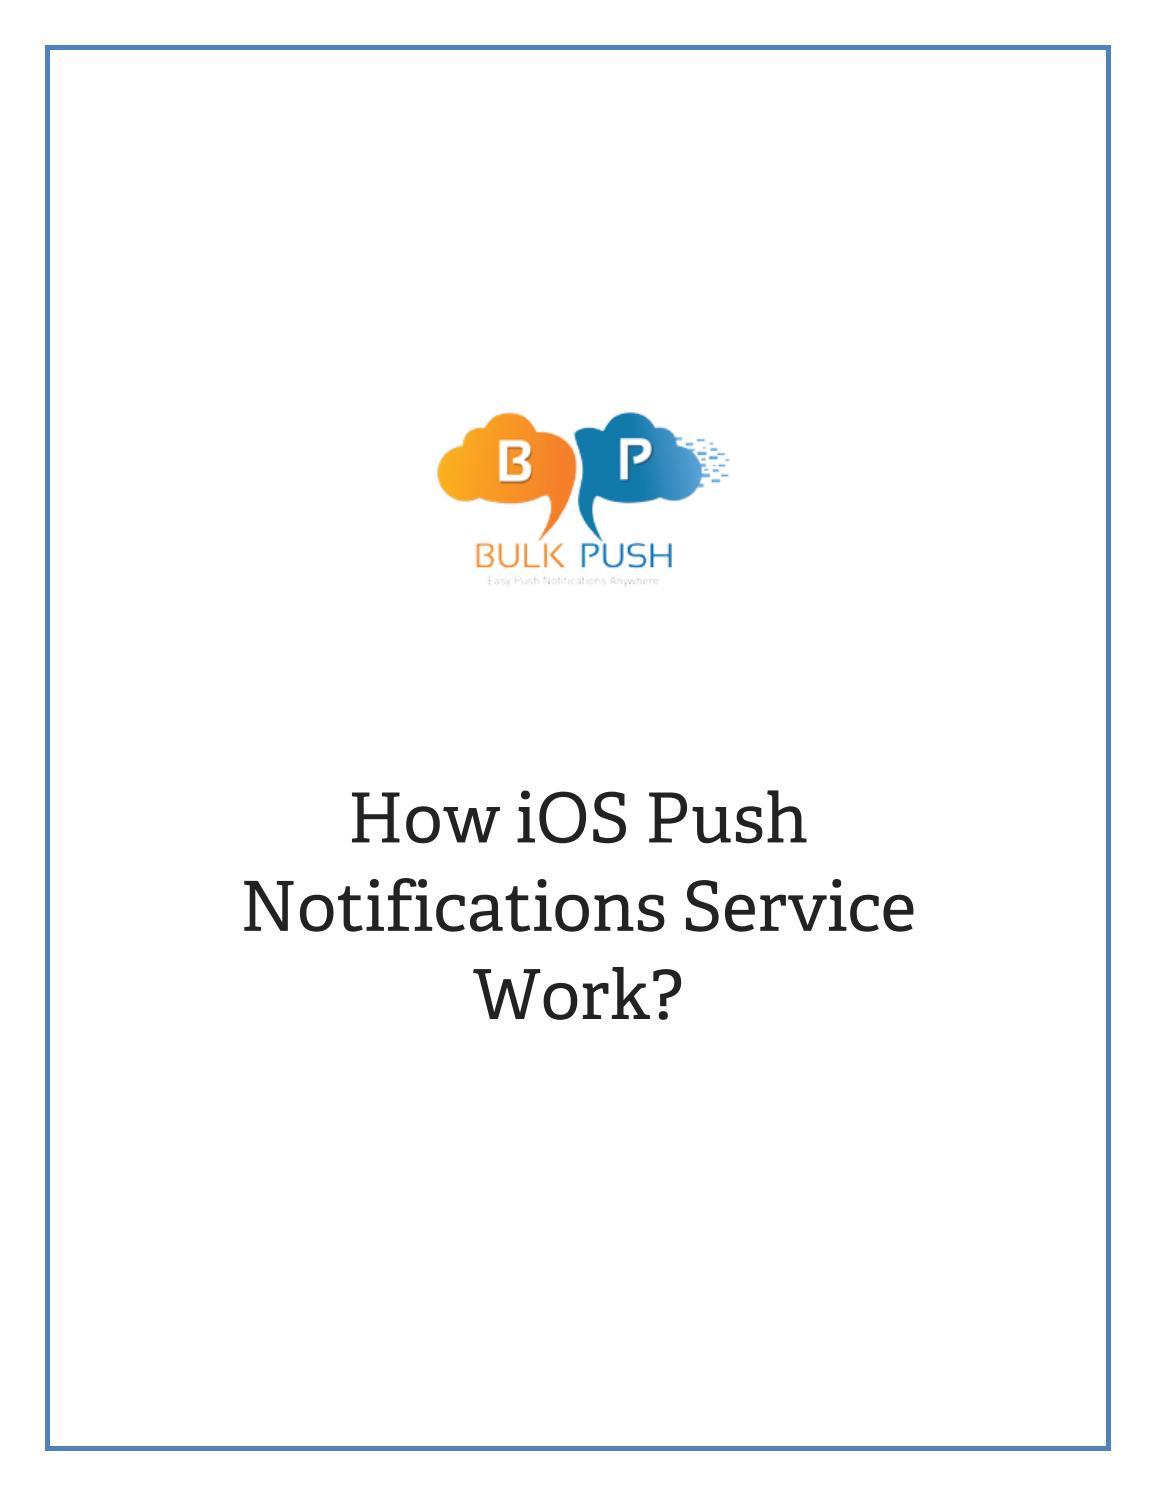 How ios push notifications service work by bulkpush - issuu